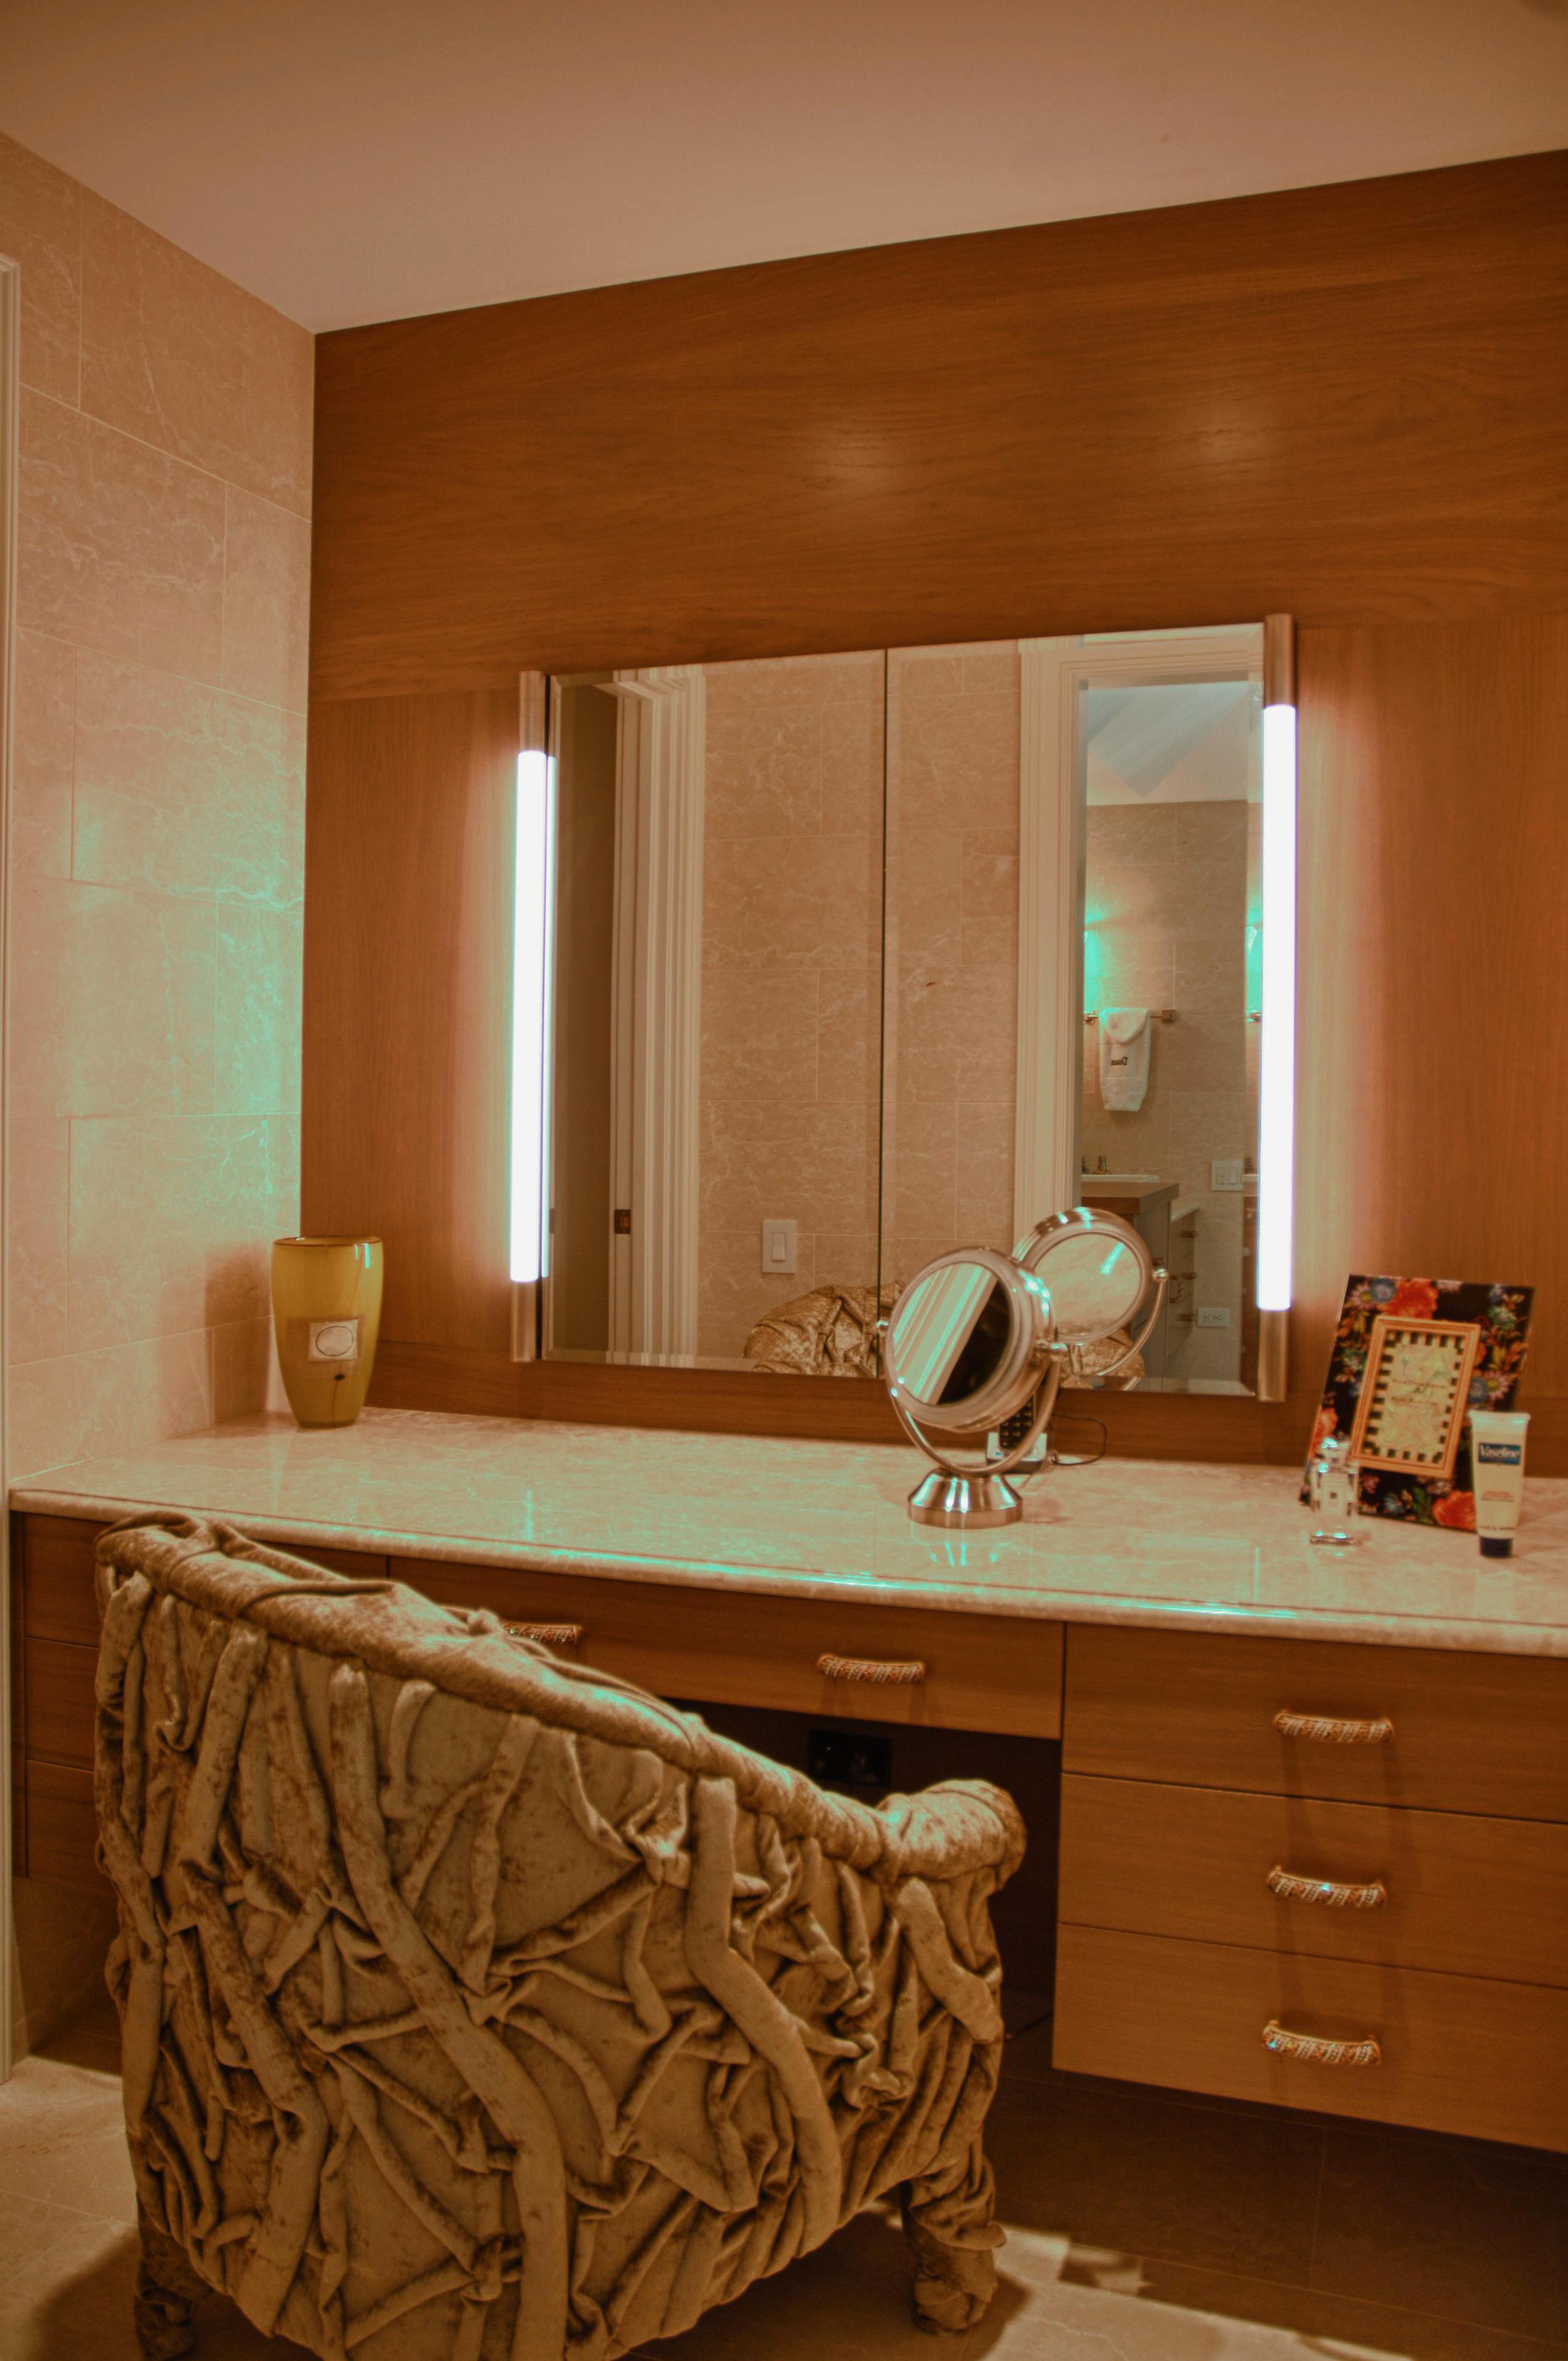 Arkin Make-up Room 01.JPG